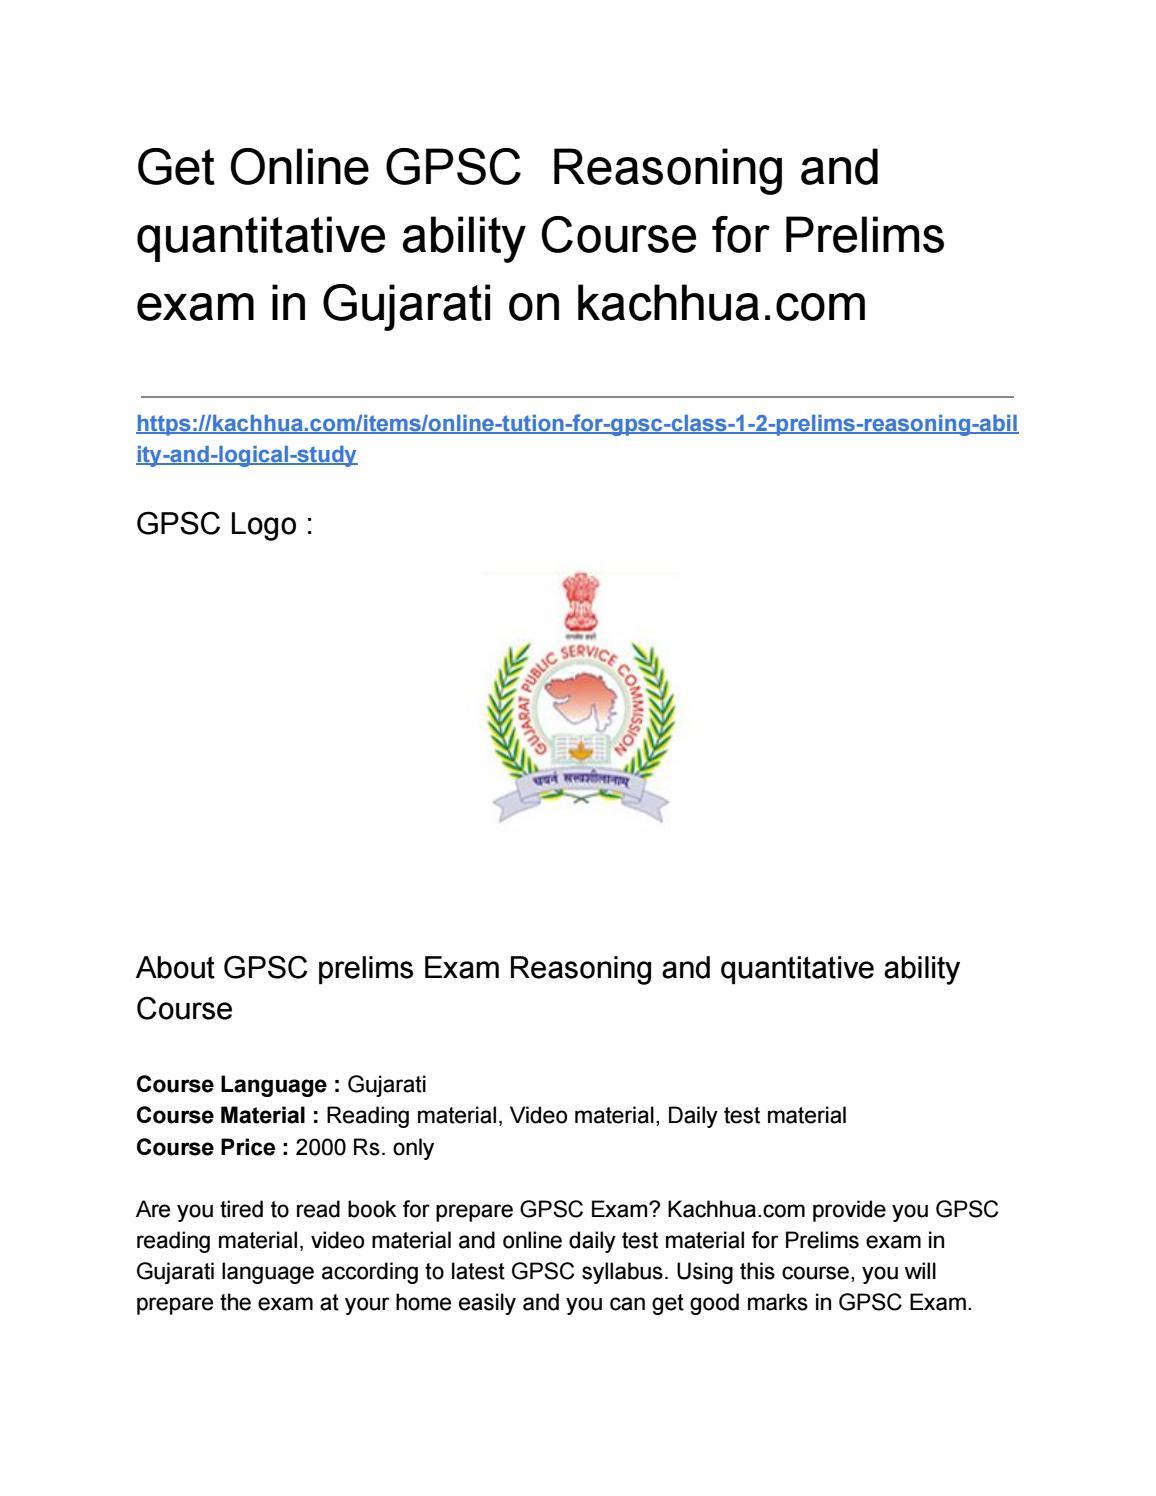 Get online gpsc reasoning and quantitative ability course for get online gpsc reasoning and quantitative ability course for prelims exam in gujarati on kachhuac by vishalptl888 issuu pooptronica